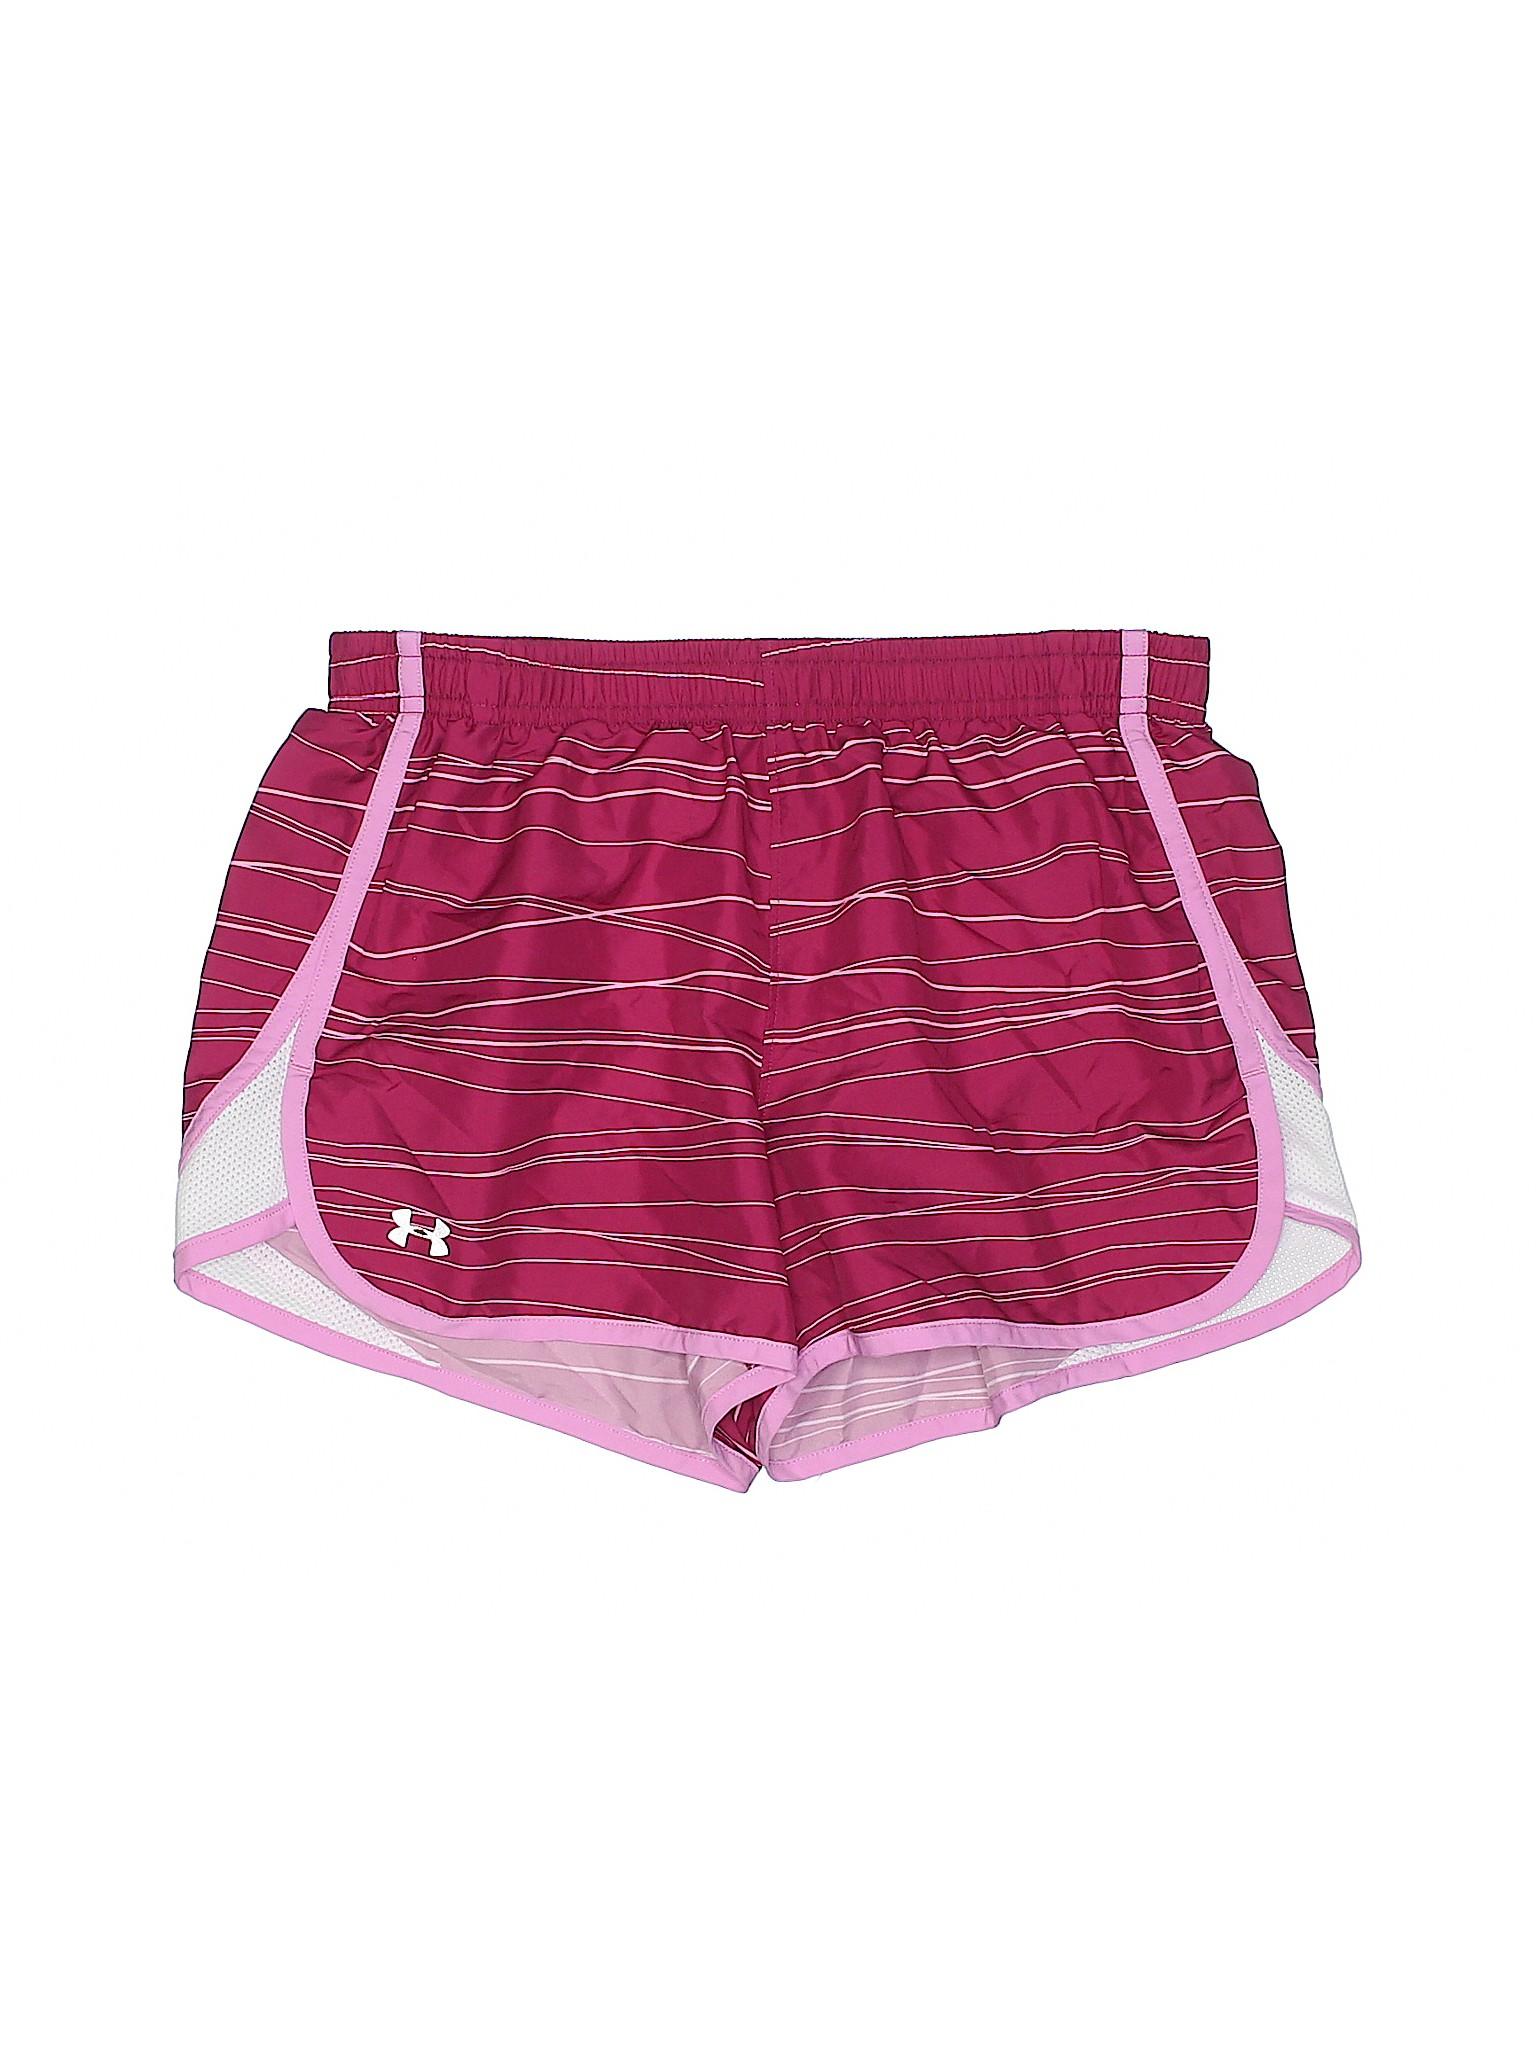 Under Athletic Athletic Under Shorts Armour Armour Boutique Boutique Shorts Boutique 4qR55wfO